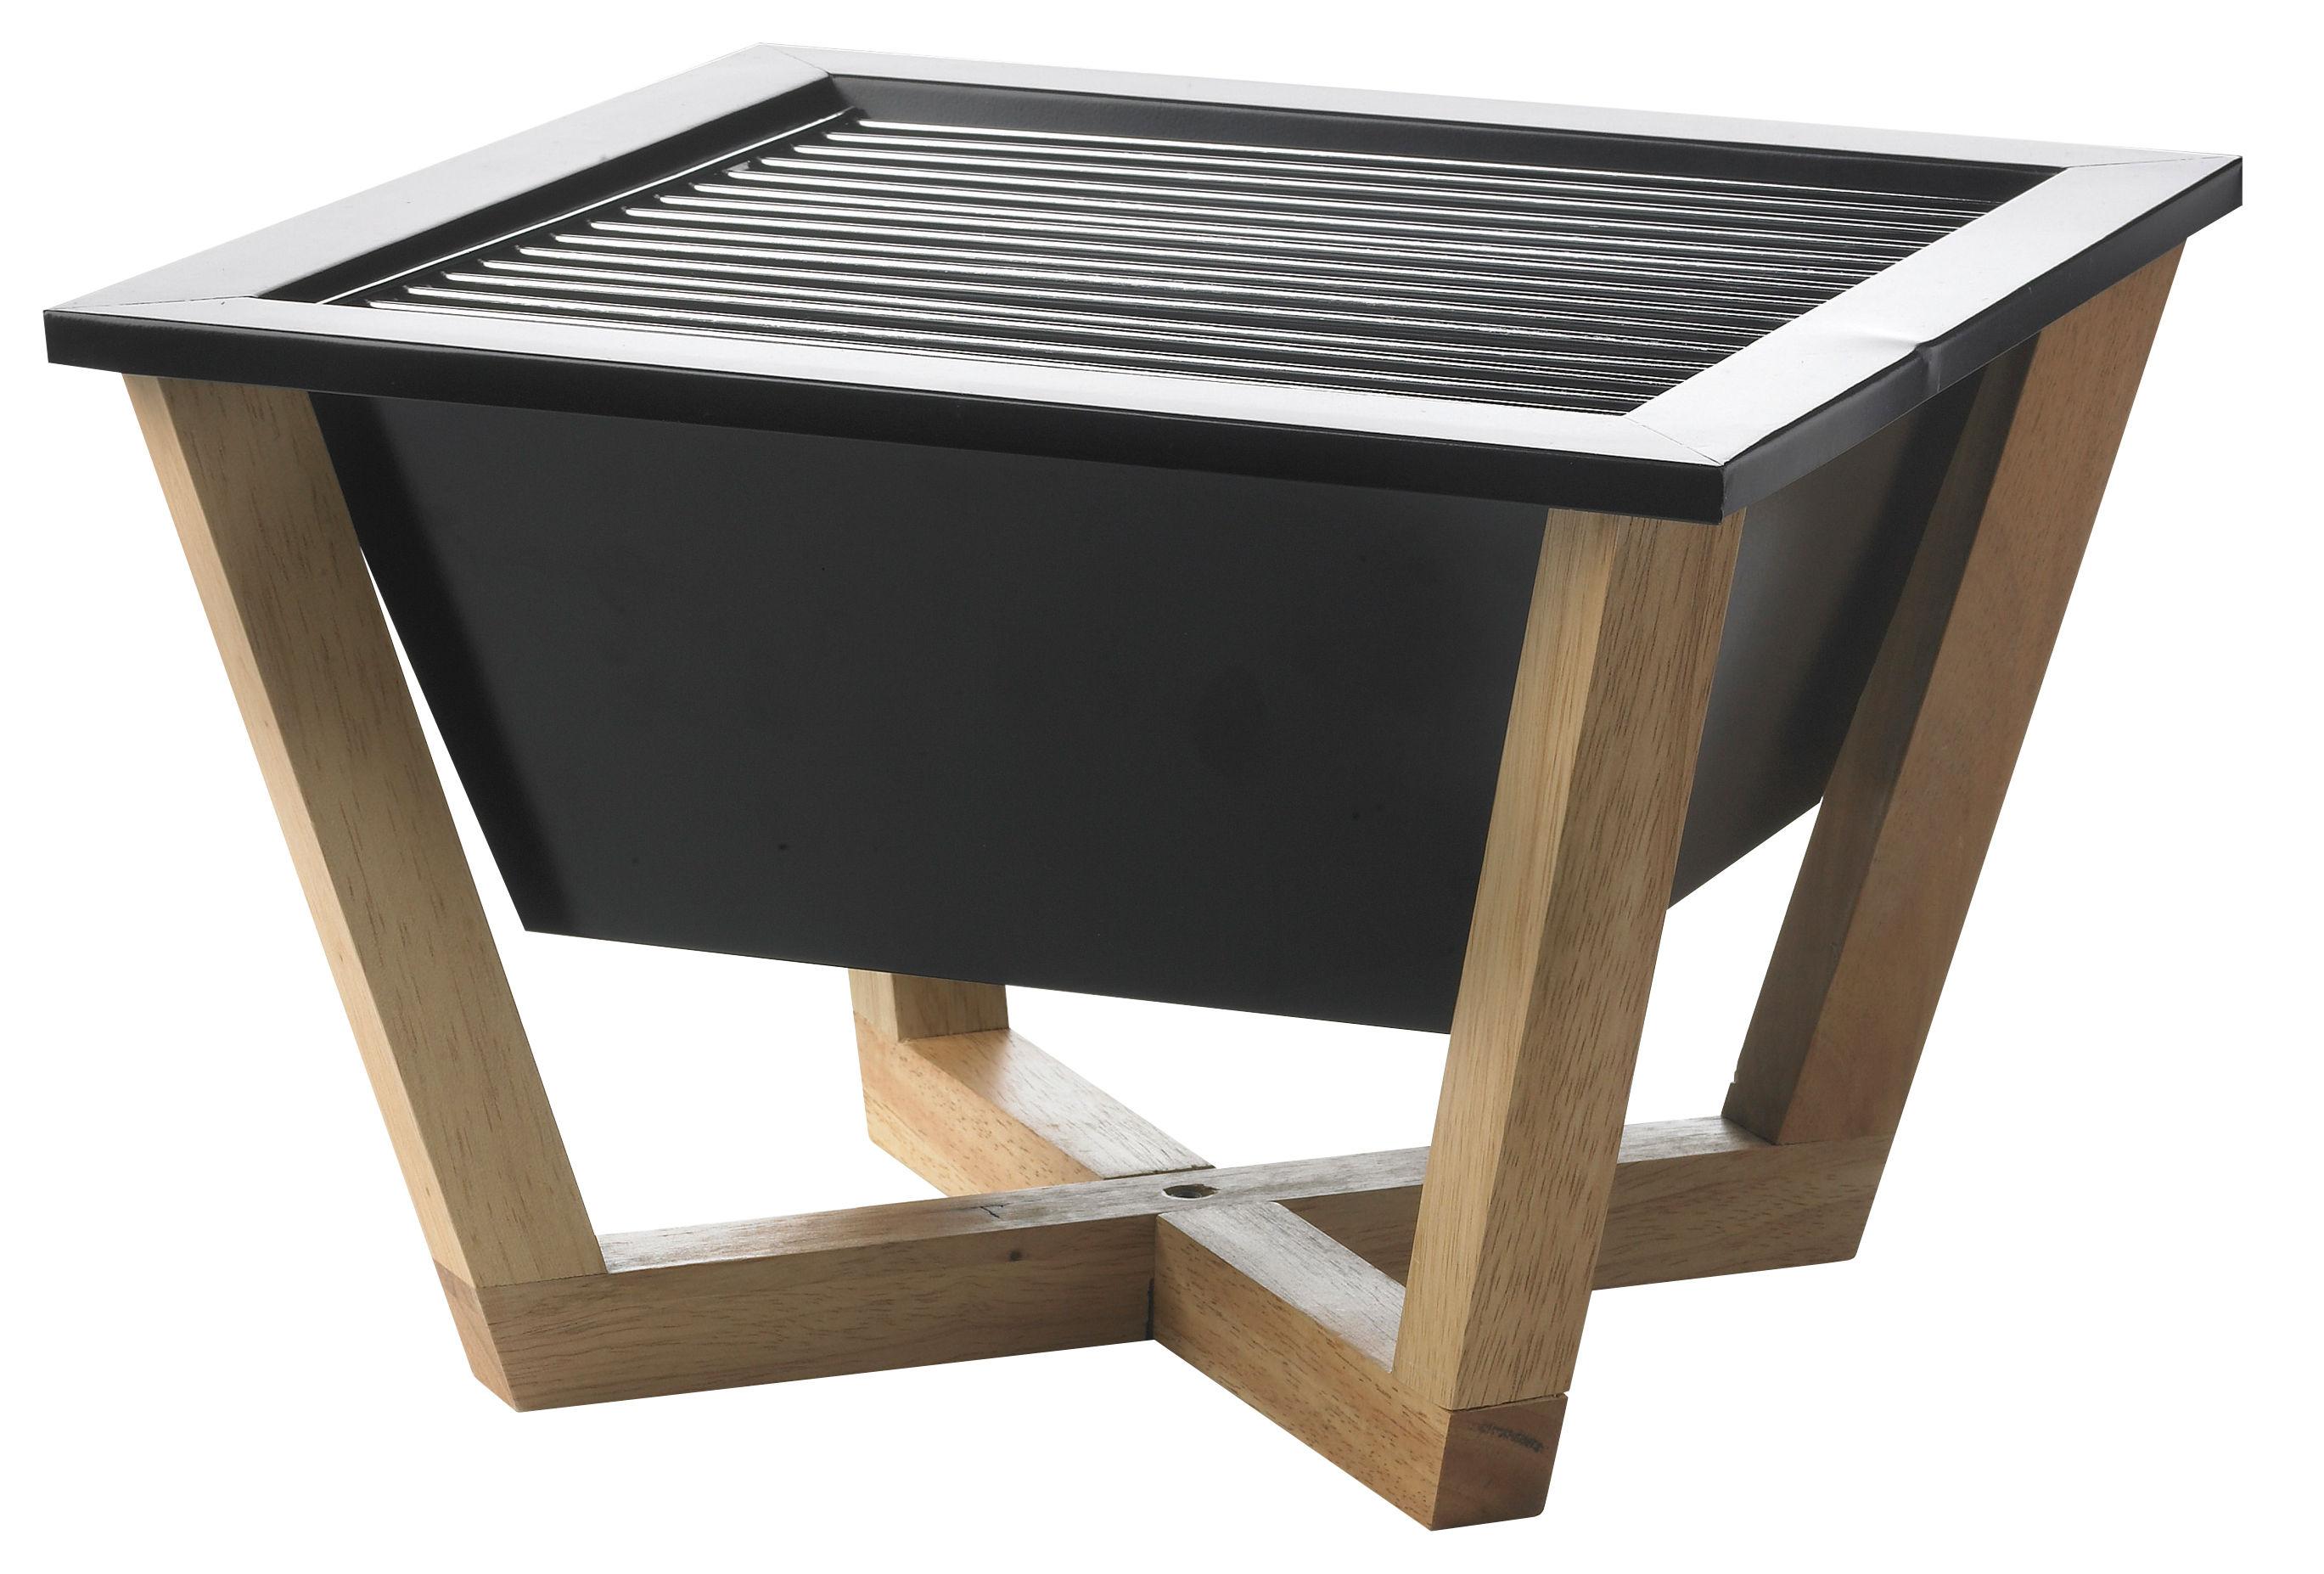 barbecue portable charbon nido xd design noir bois. Black Bedroom Furniture Sets. Home Design Ideas